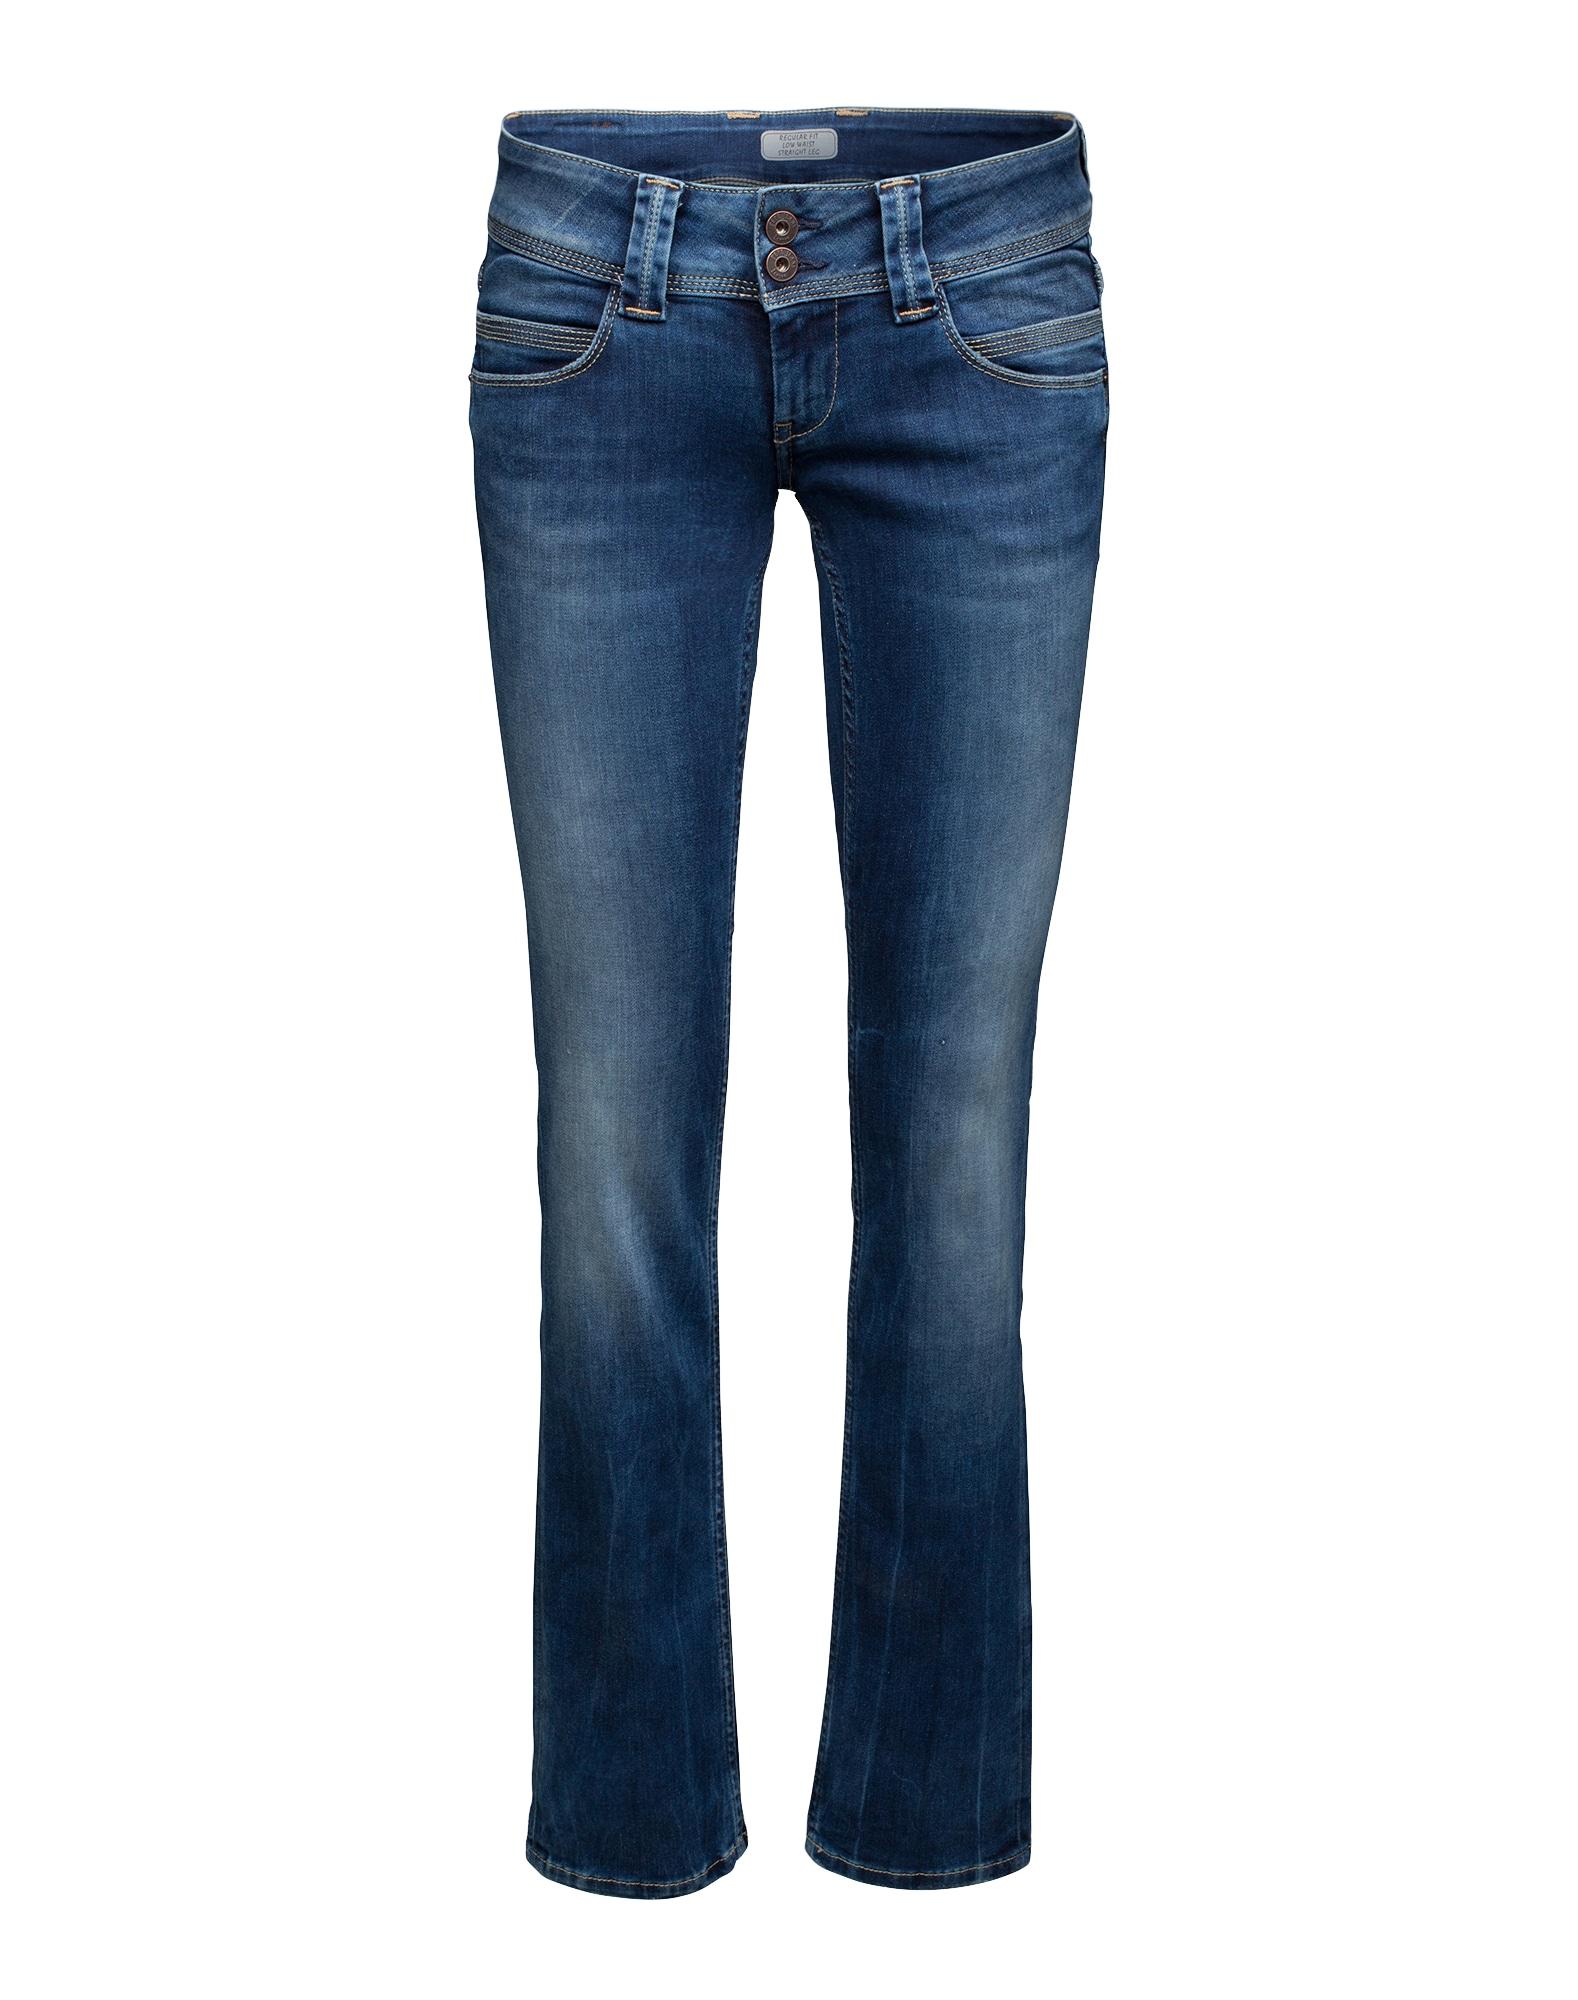 Pepe Jeans Dames Jeans Venus blauw denim